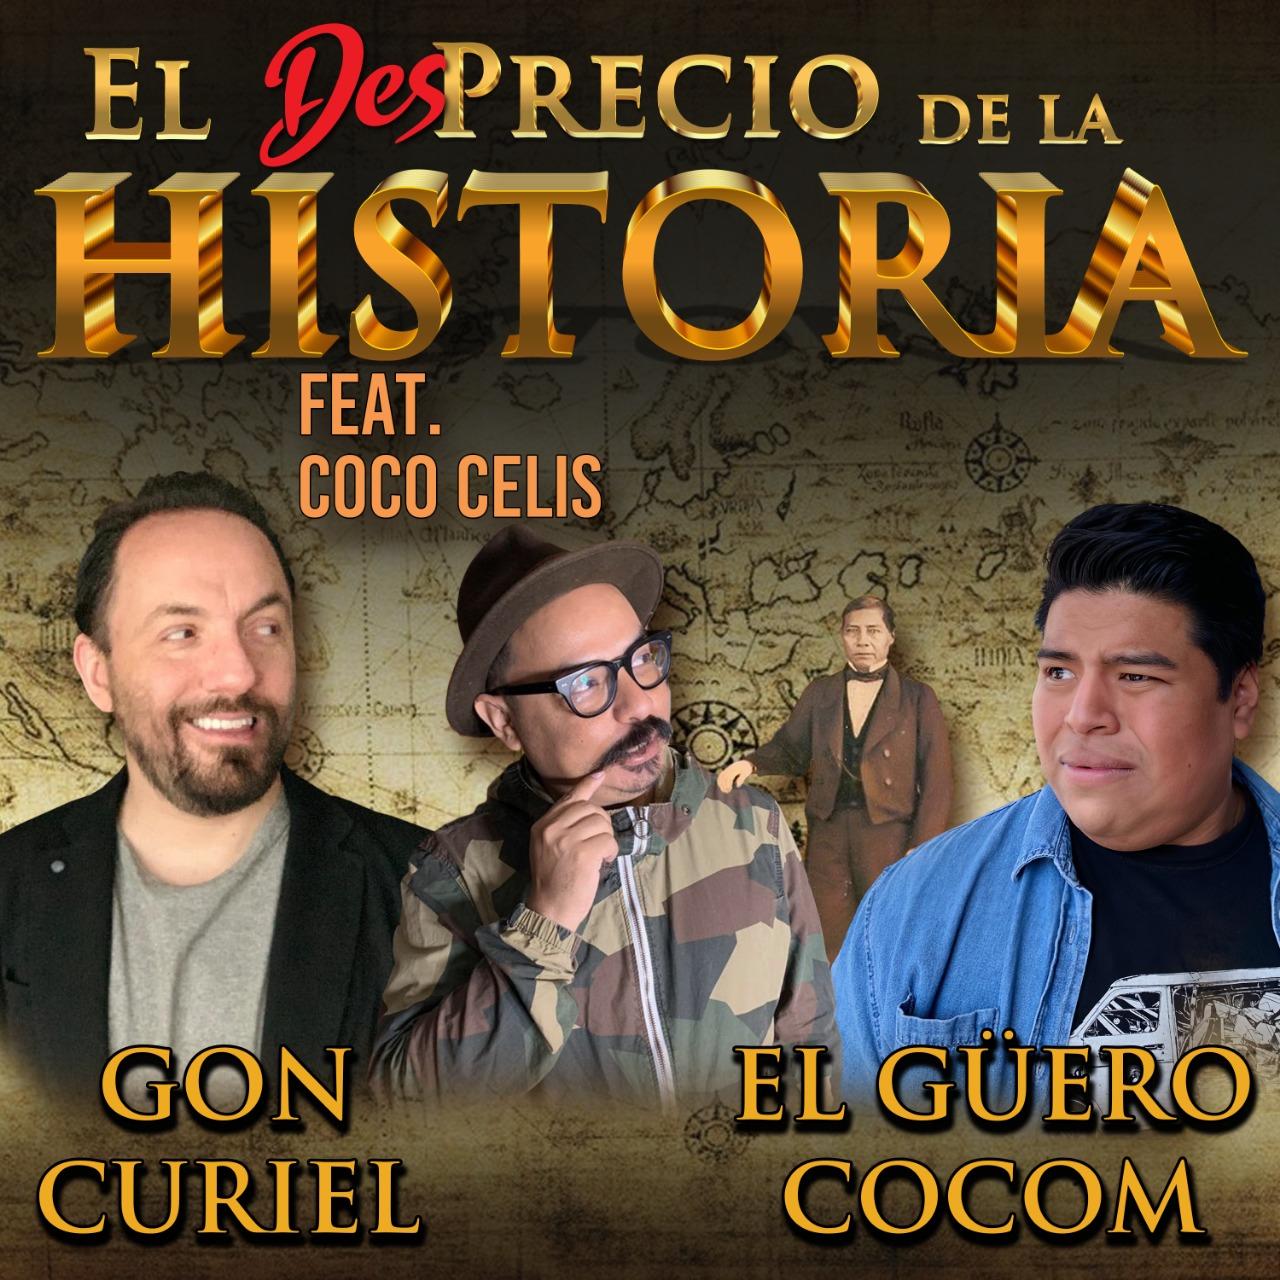 19 - Benito Juárez plagió su frase ft. Coco Celis